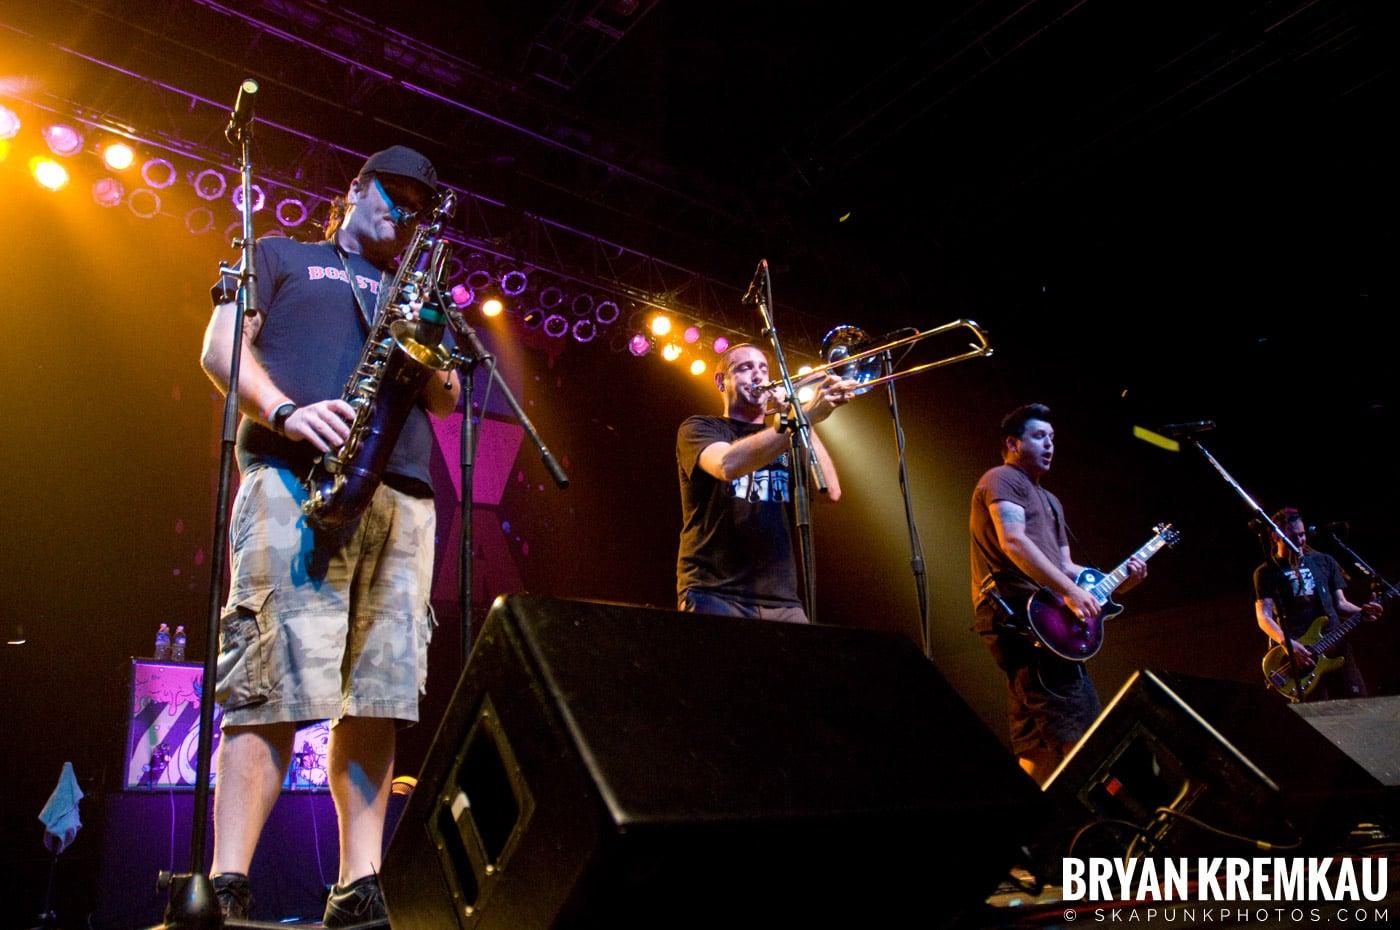 Less Than Jake @ Roseland Ballroom, NYC - 6.26.08 (7)